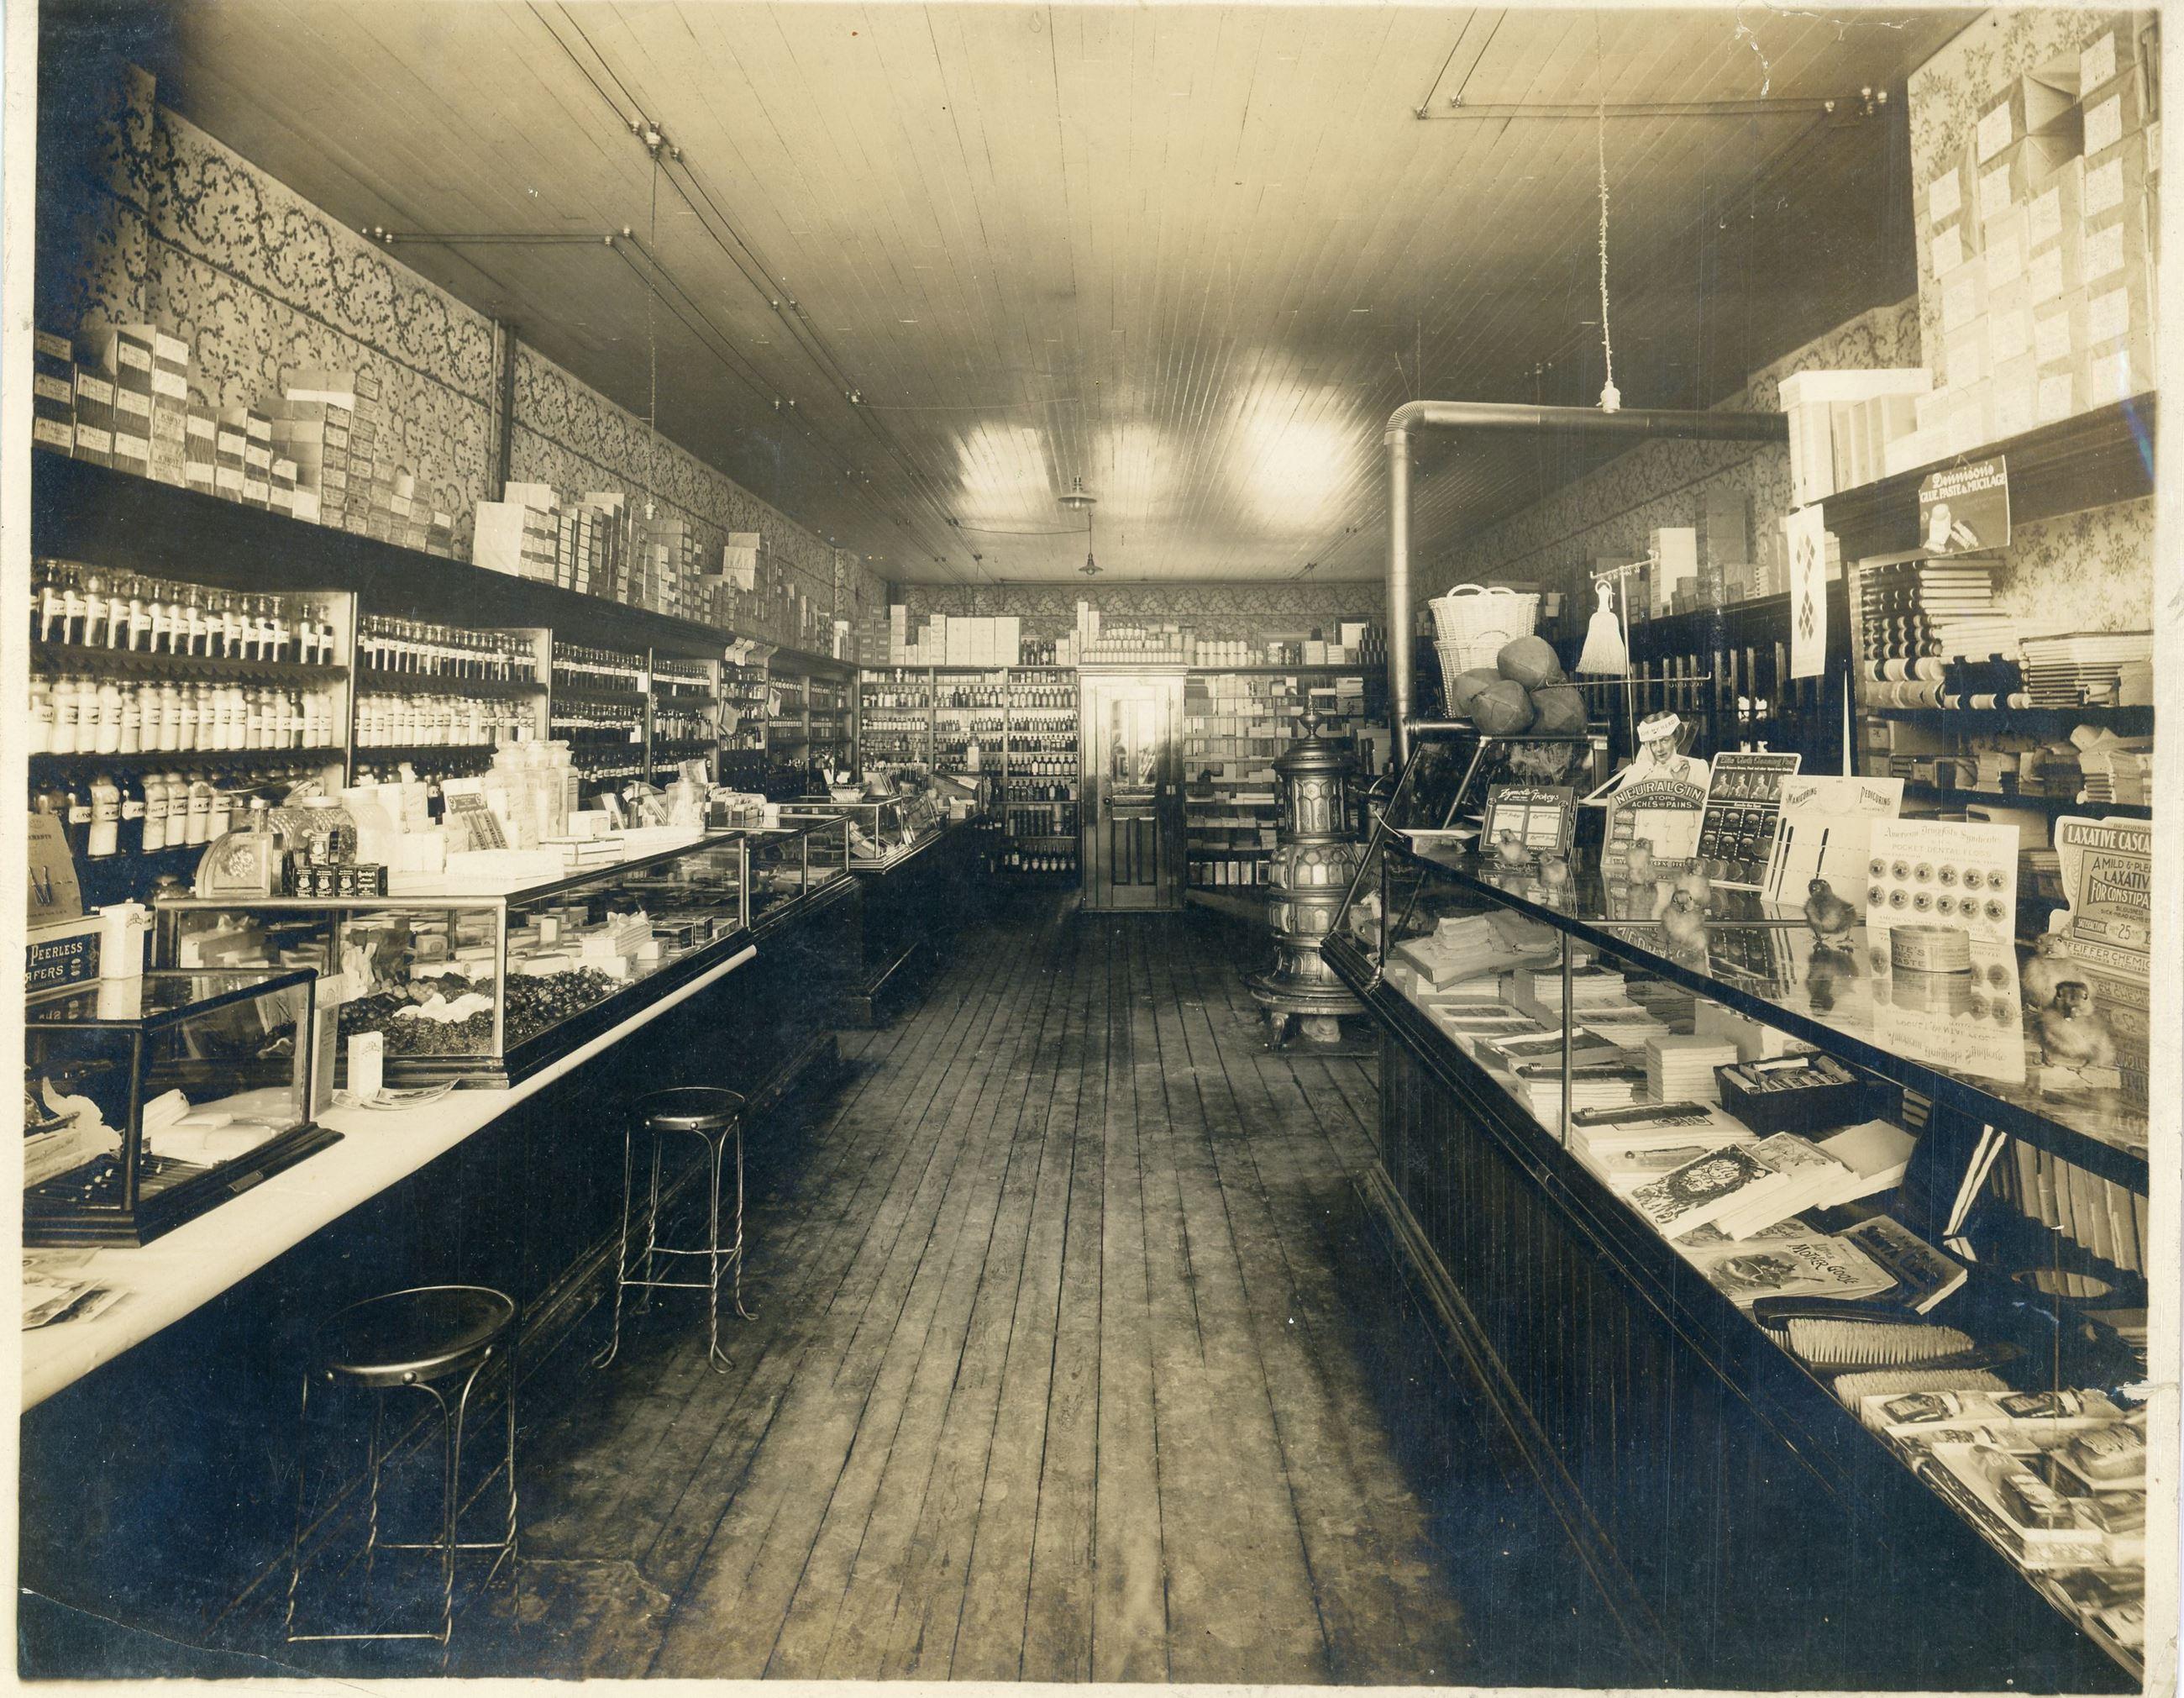 New york livingston county leicester - Interior Of Store Avon